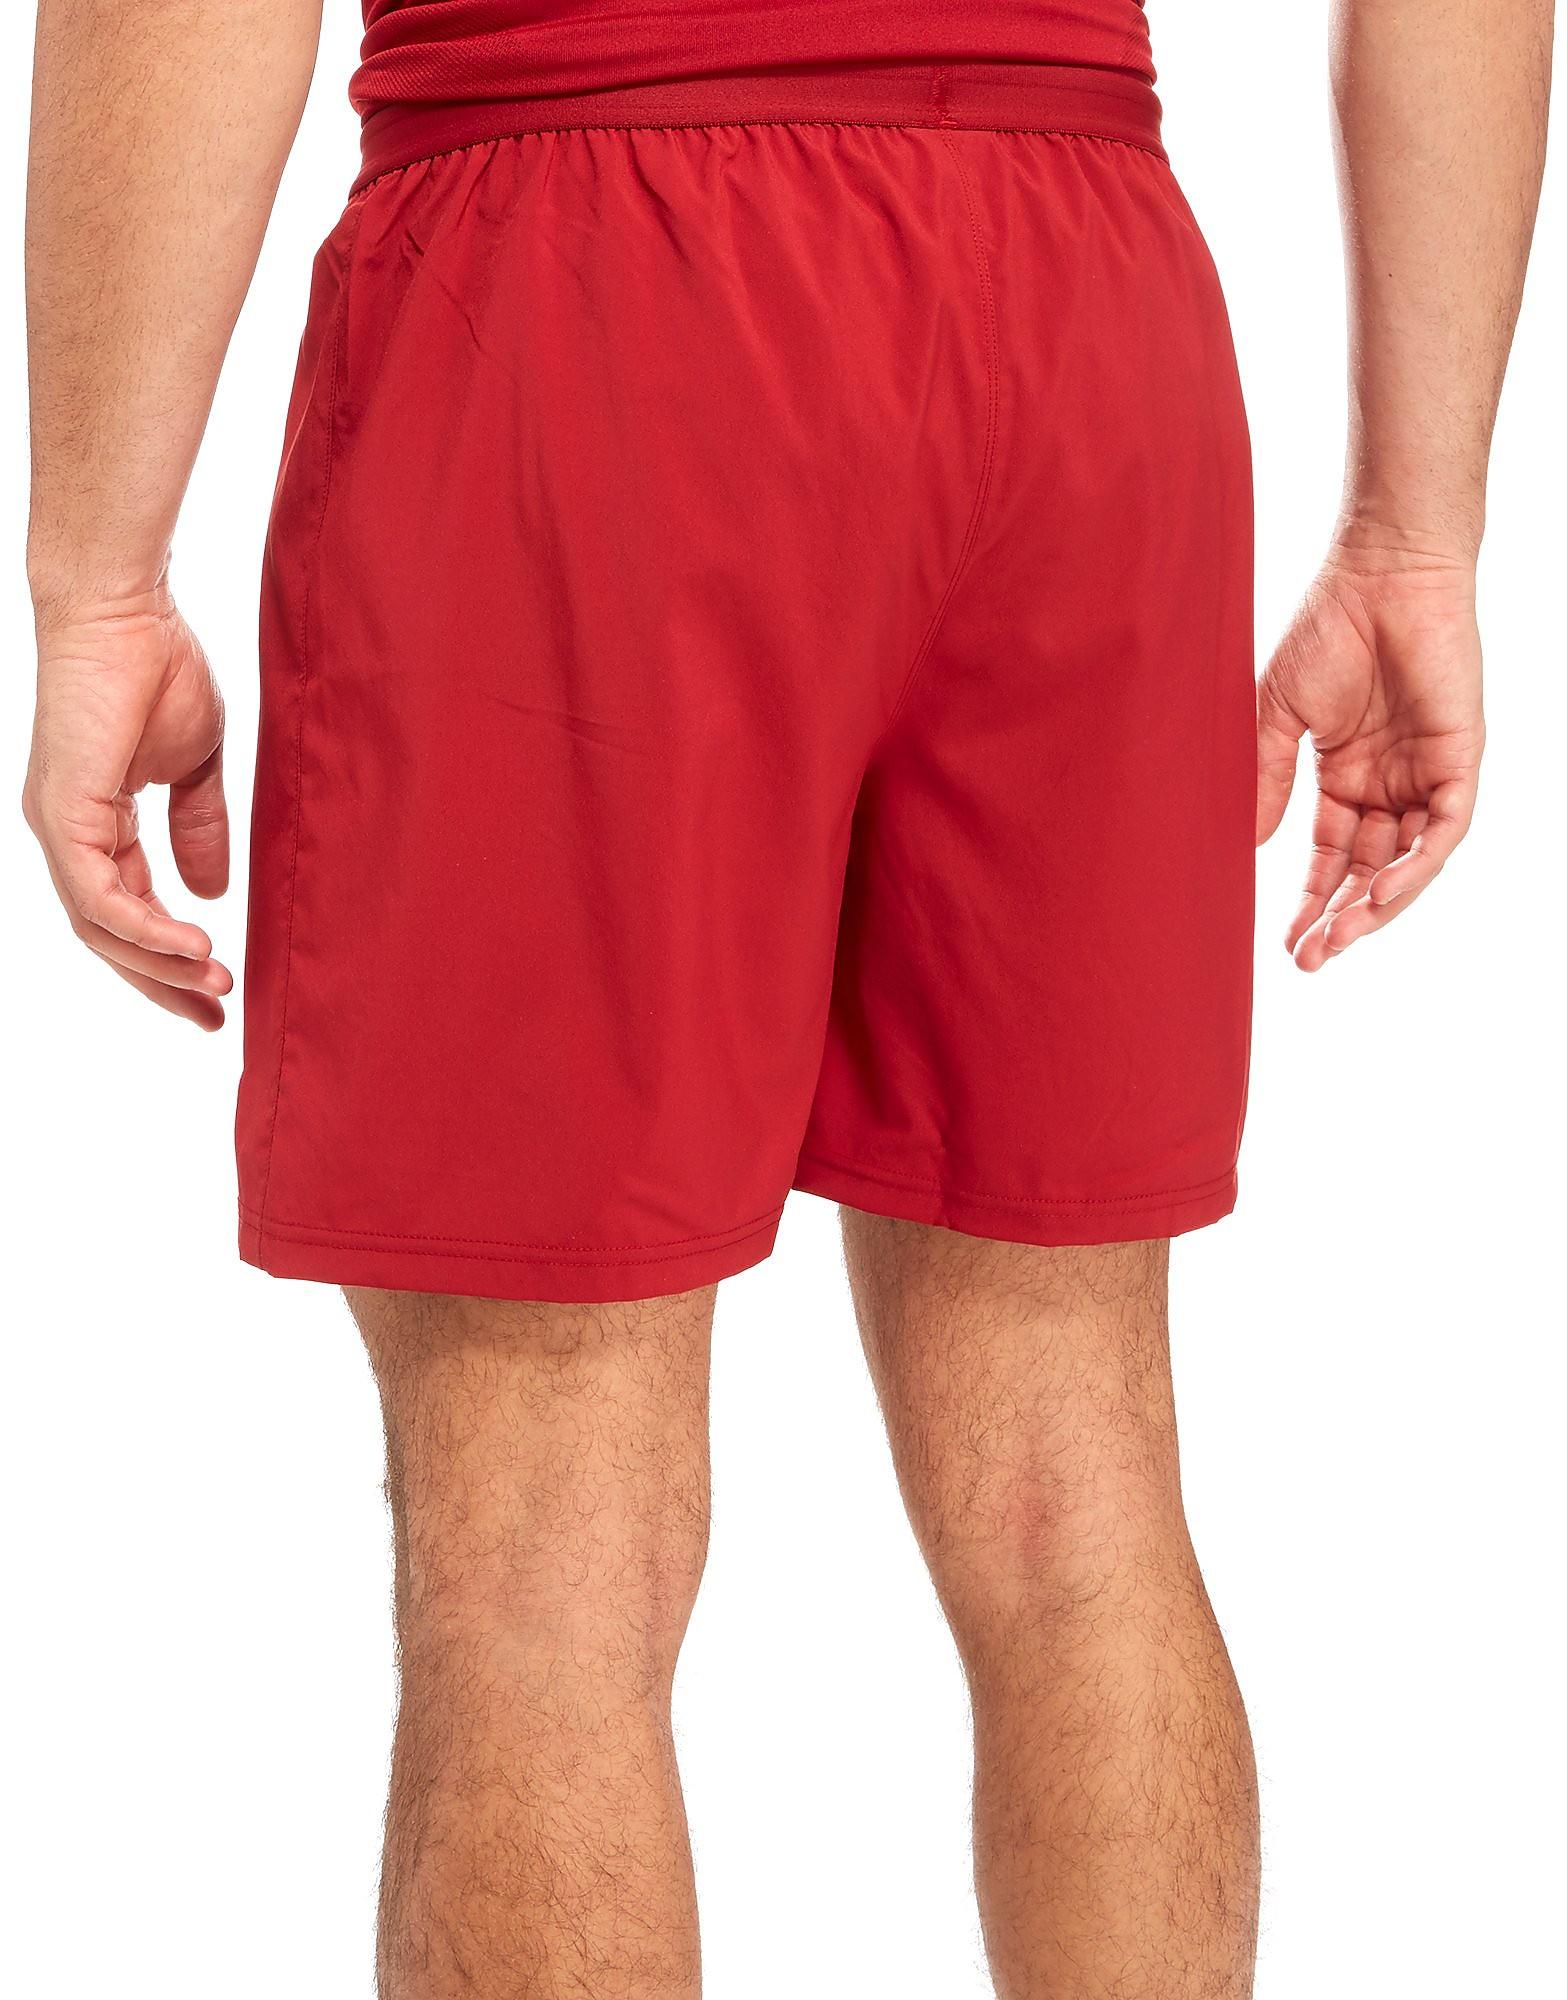 New Balance Liverpool FC 2017/18 Home Shorts